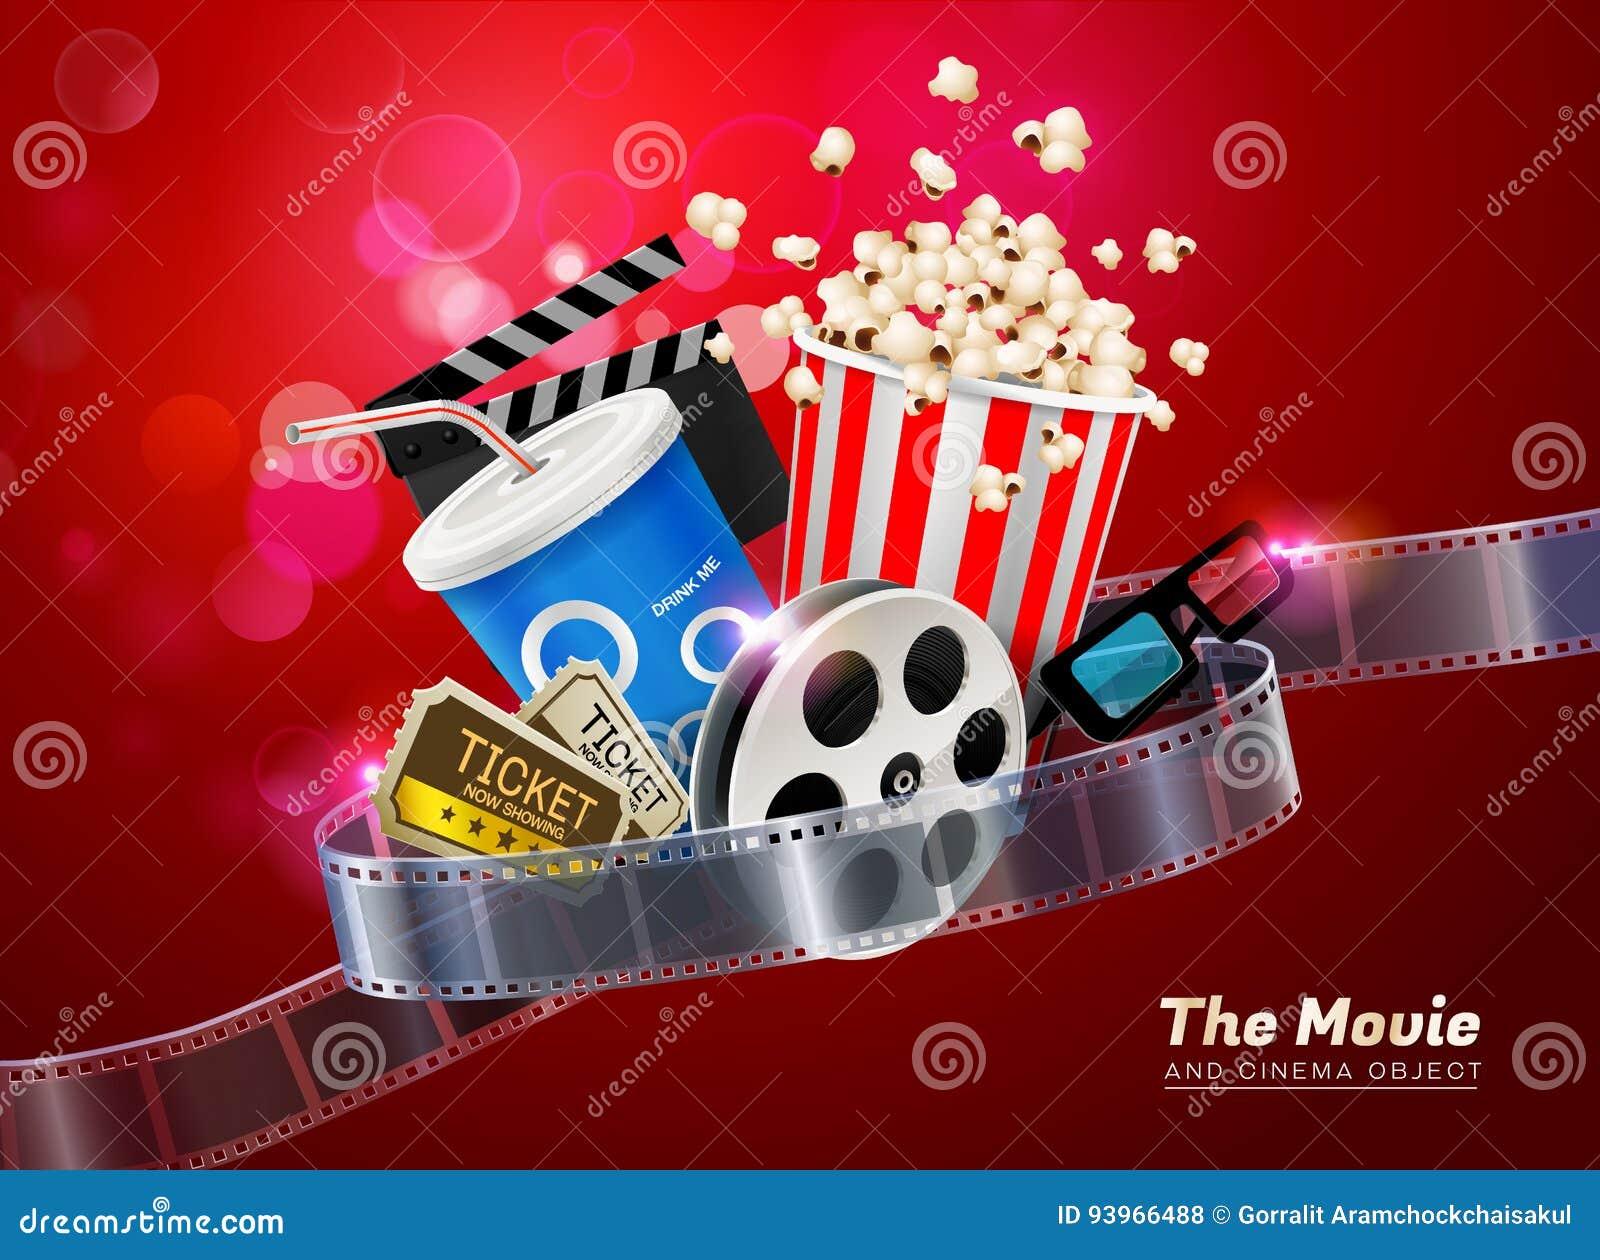 Cinema movie theater object on sparkling light background